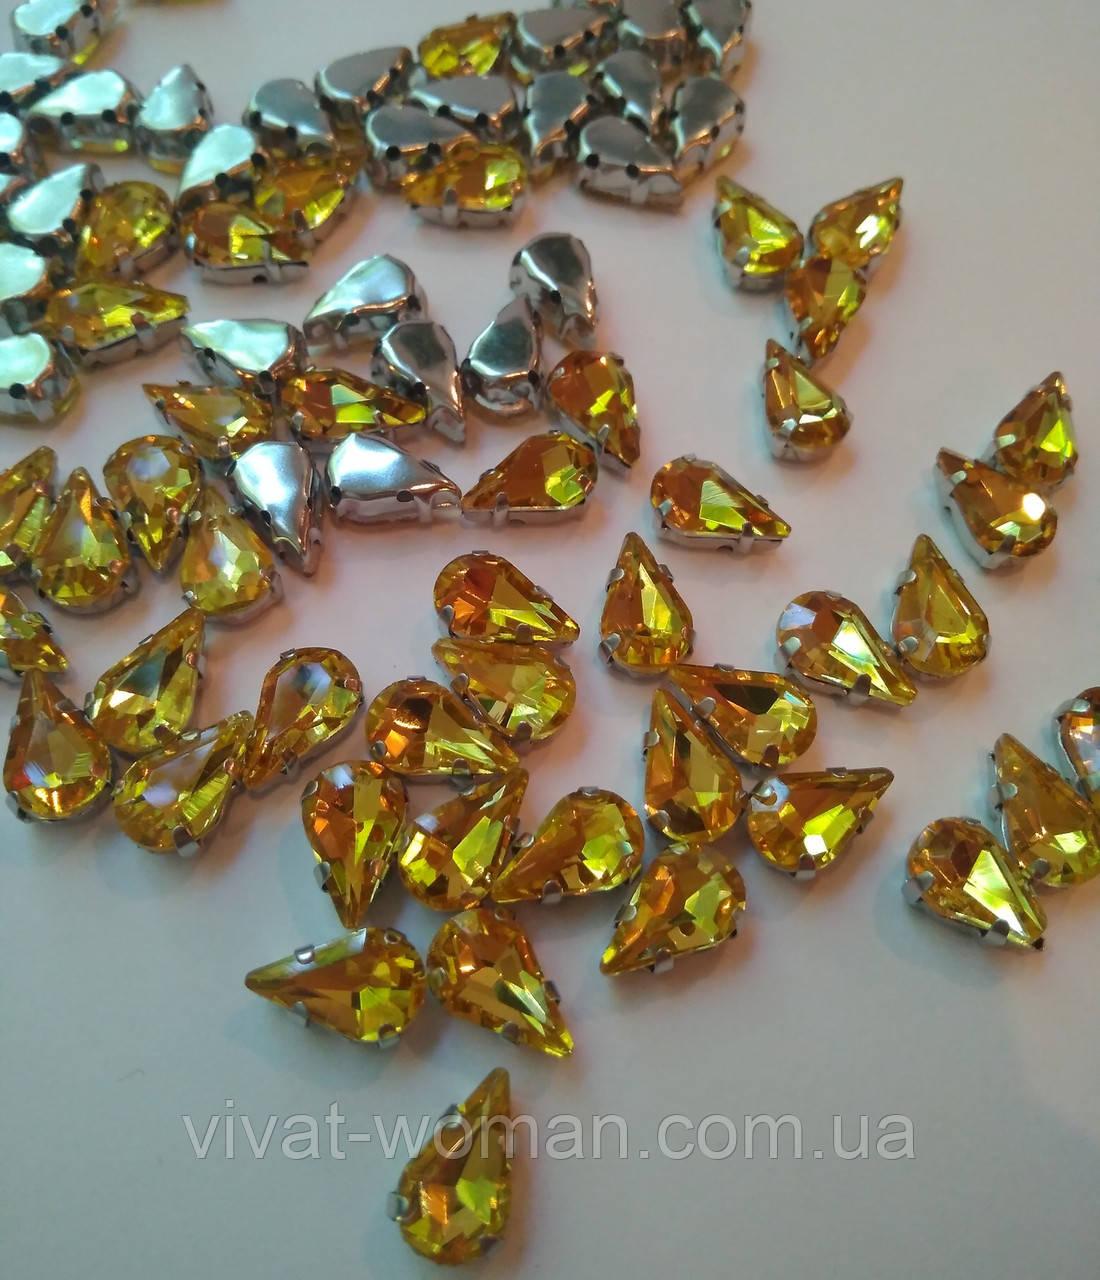 Стразы в цапах, Капля 6х10 мм, Topaz, стекло, серебряные цапы. Цена за 1 шт